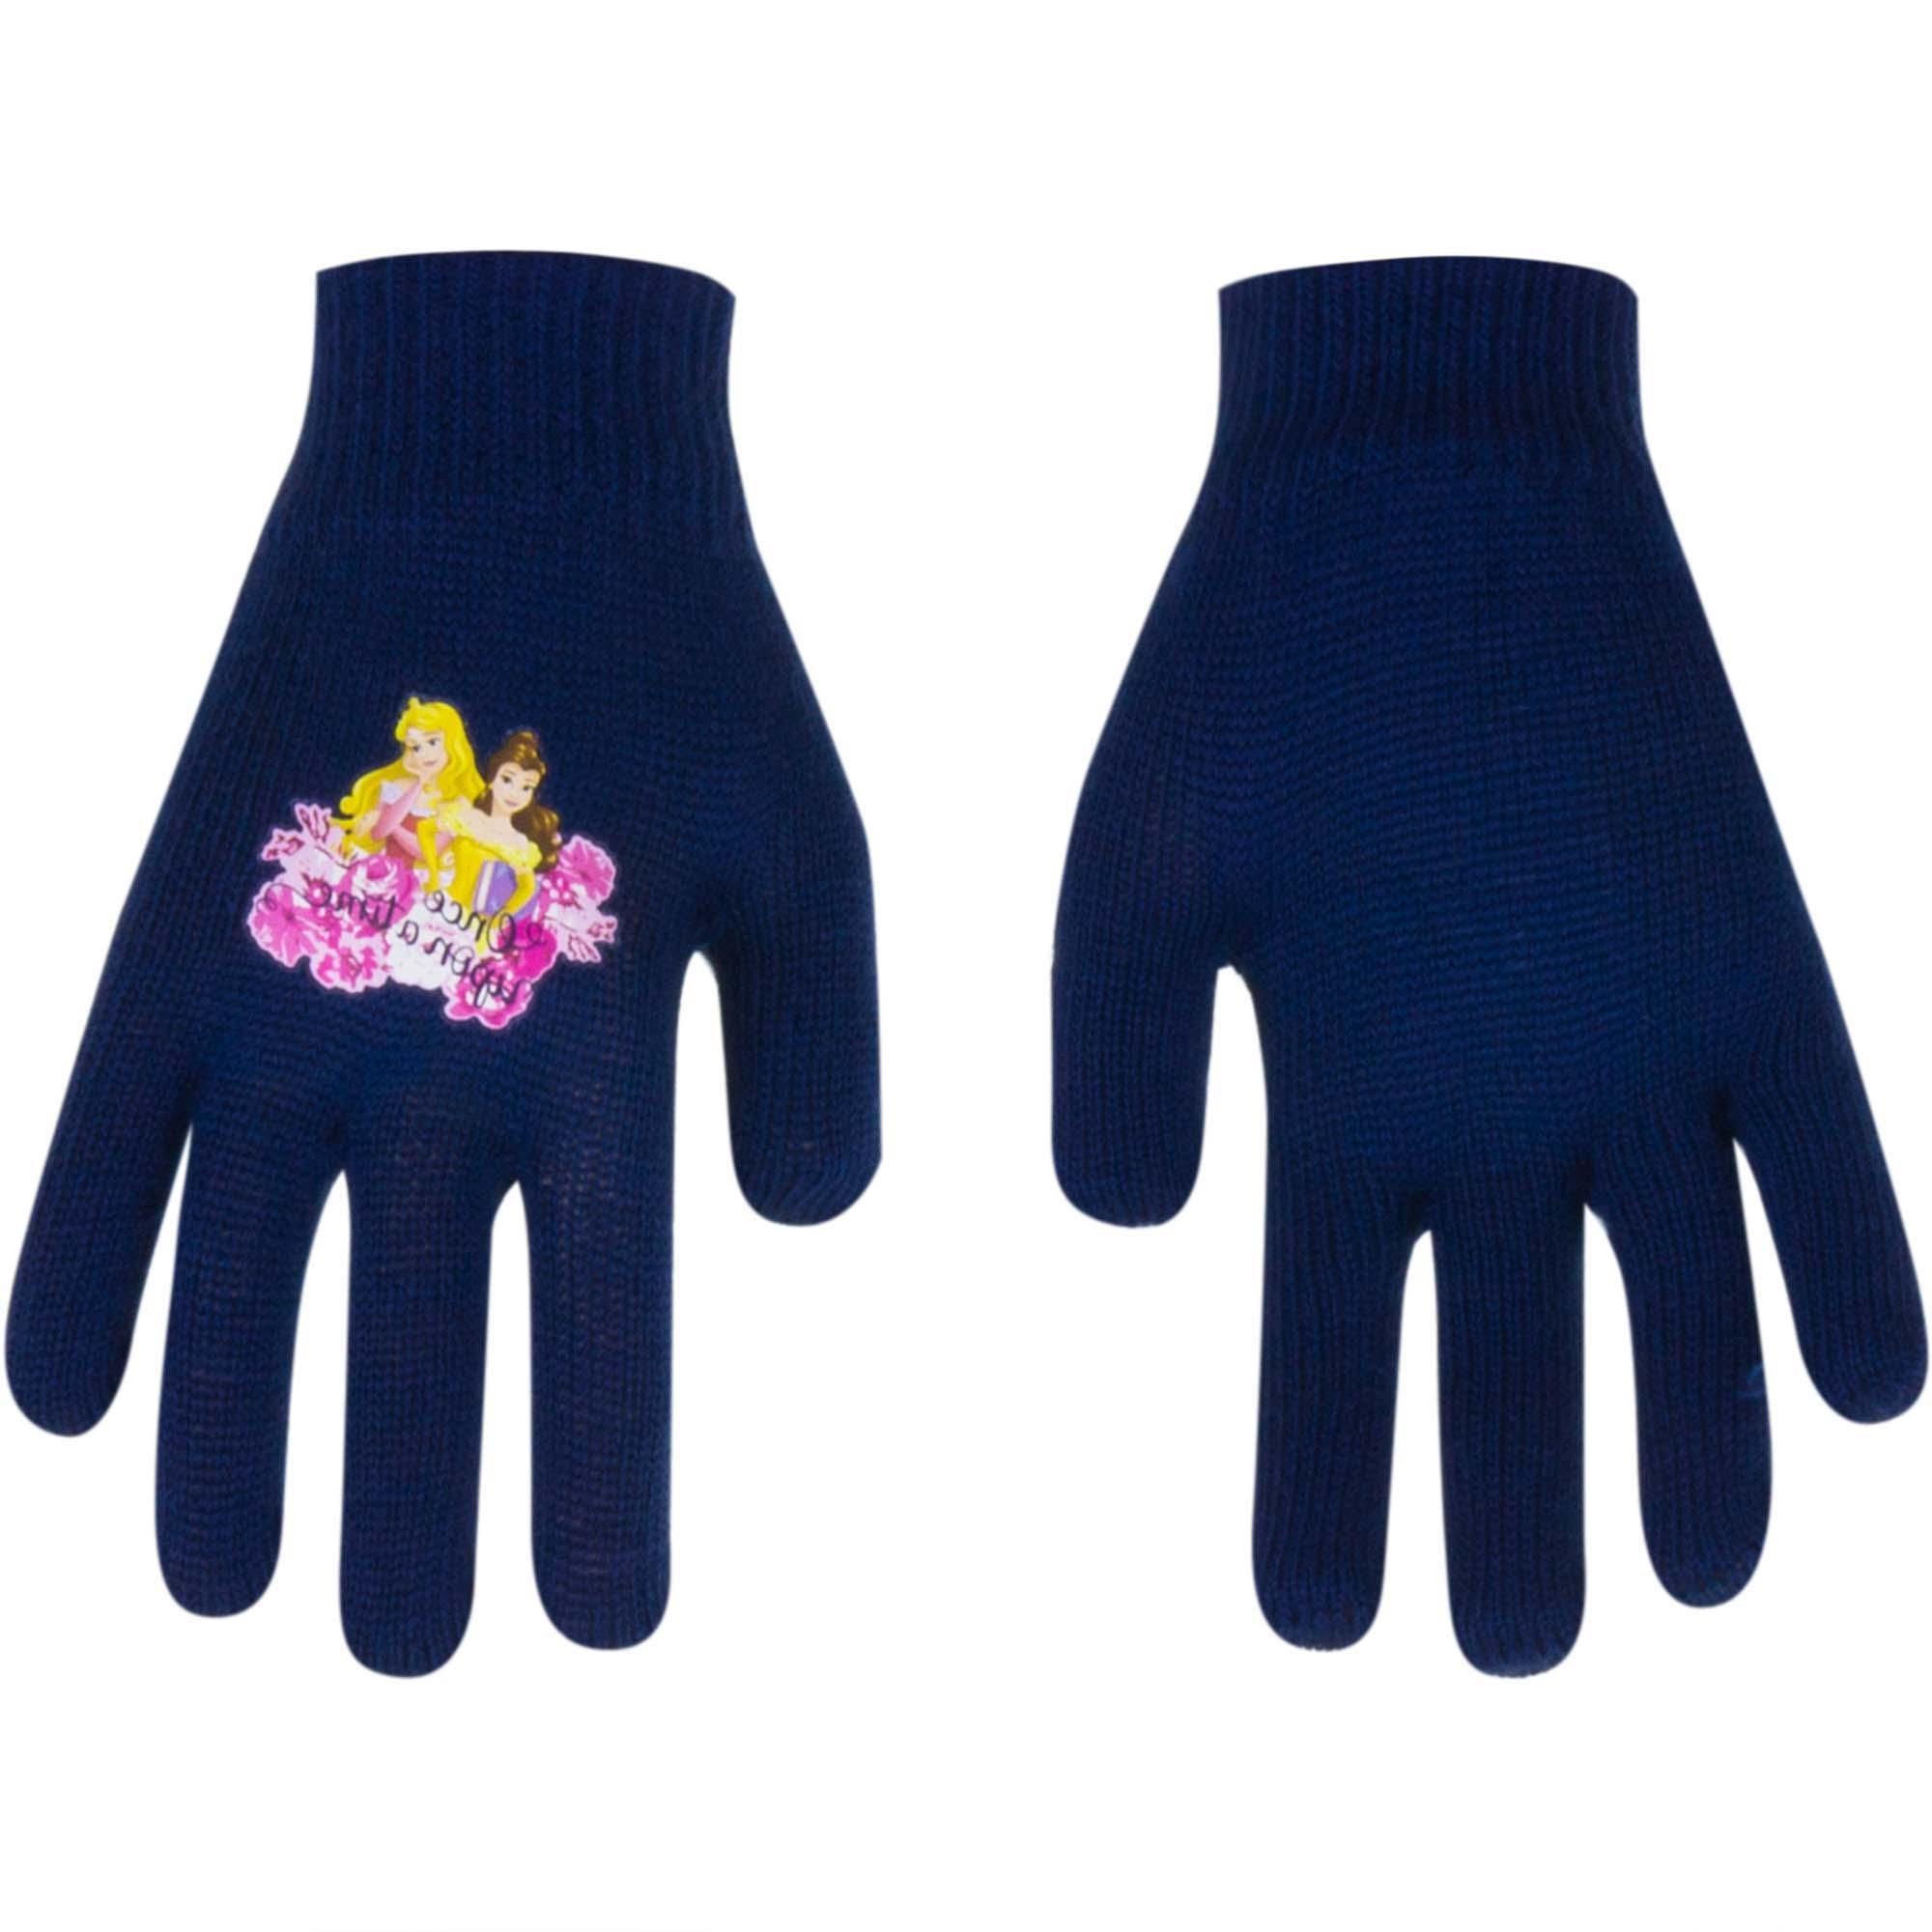 Princess gloves Magic_Navy (Ηλικία: 2-5 ετών)